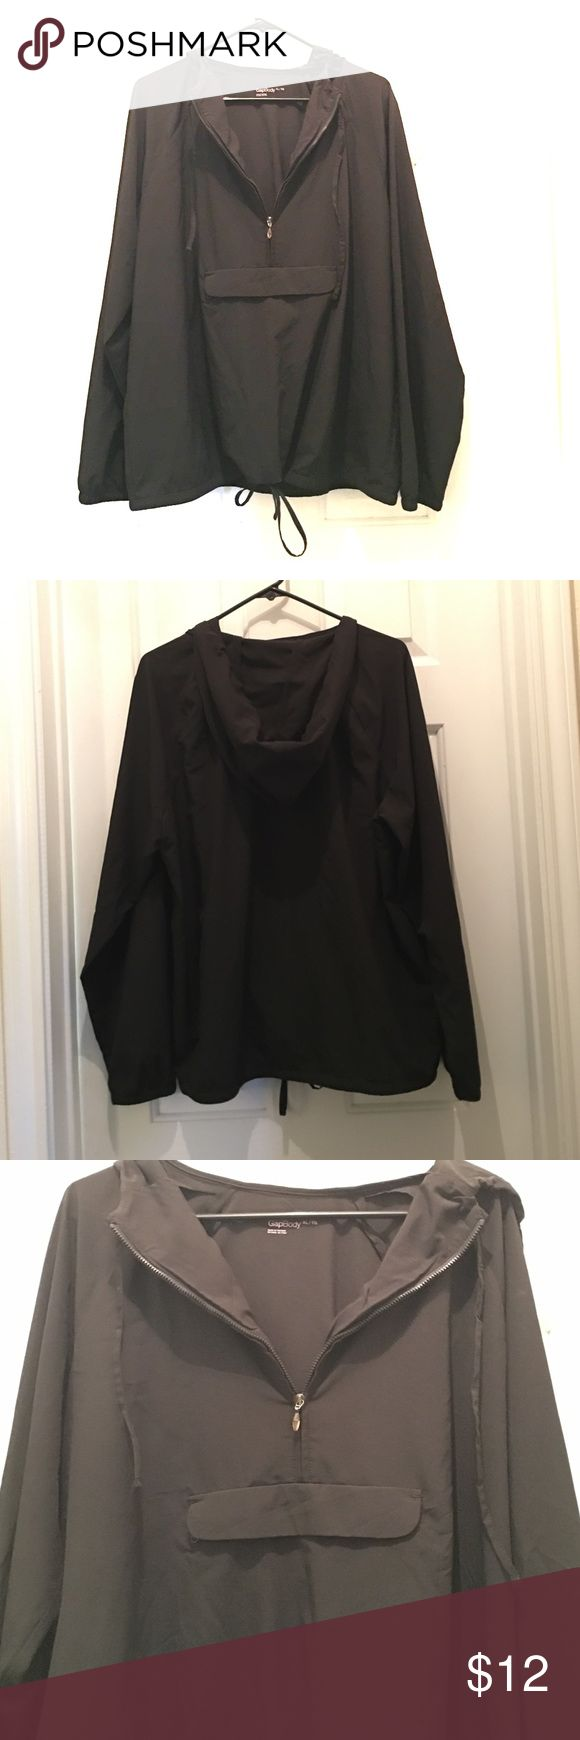 🔥ONE DAY SALE - NWOT Gap Black Windbreaker NEW never been worn, lightweight windbreaker - pocket in front zips and Velcro's - this won't last long, buy me!! GAP Jackets & Coats